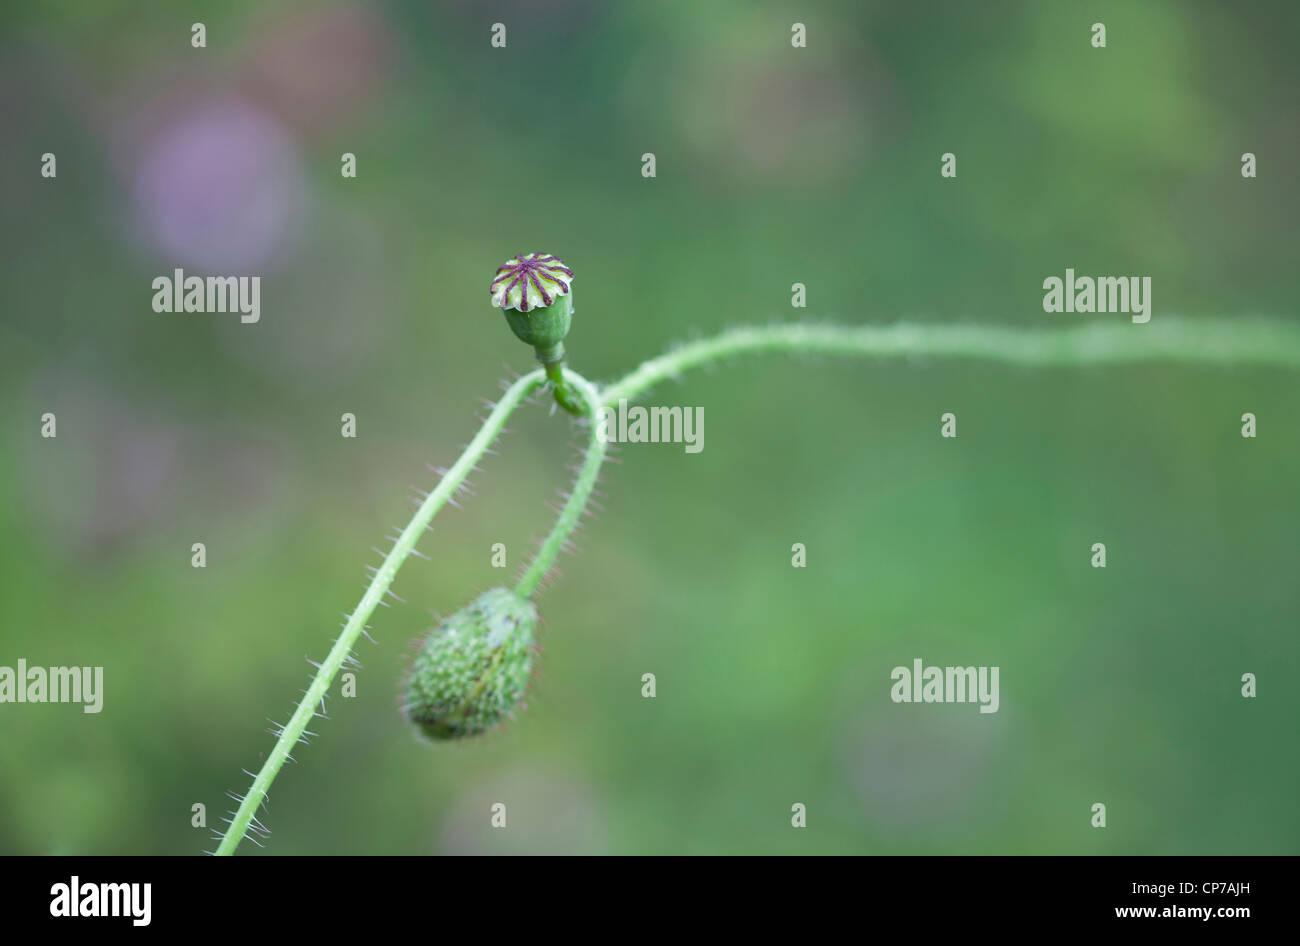 Papaver rhoeas, Poppy, Green, Green. - Stock Image